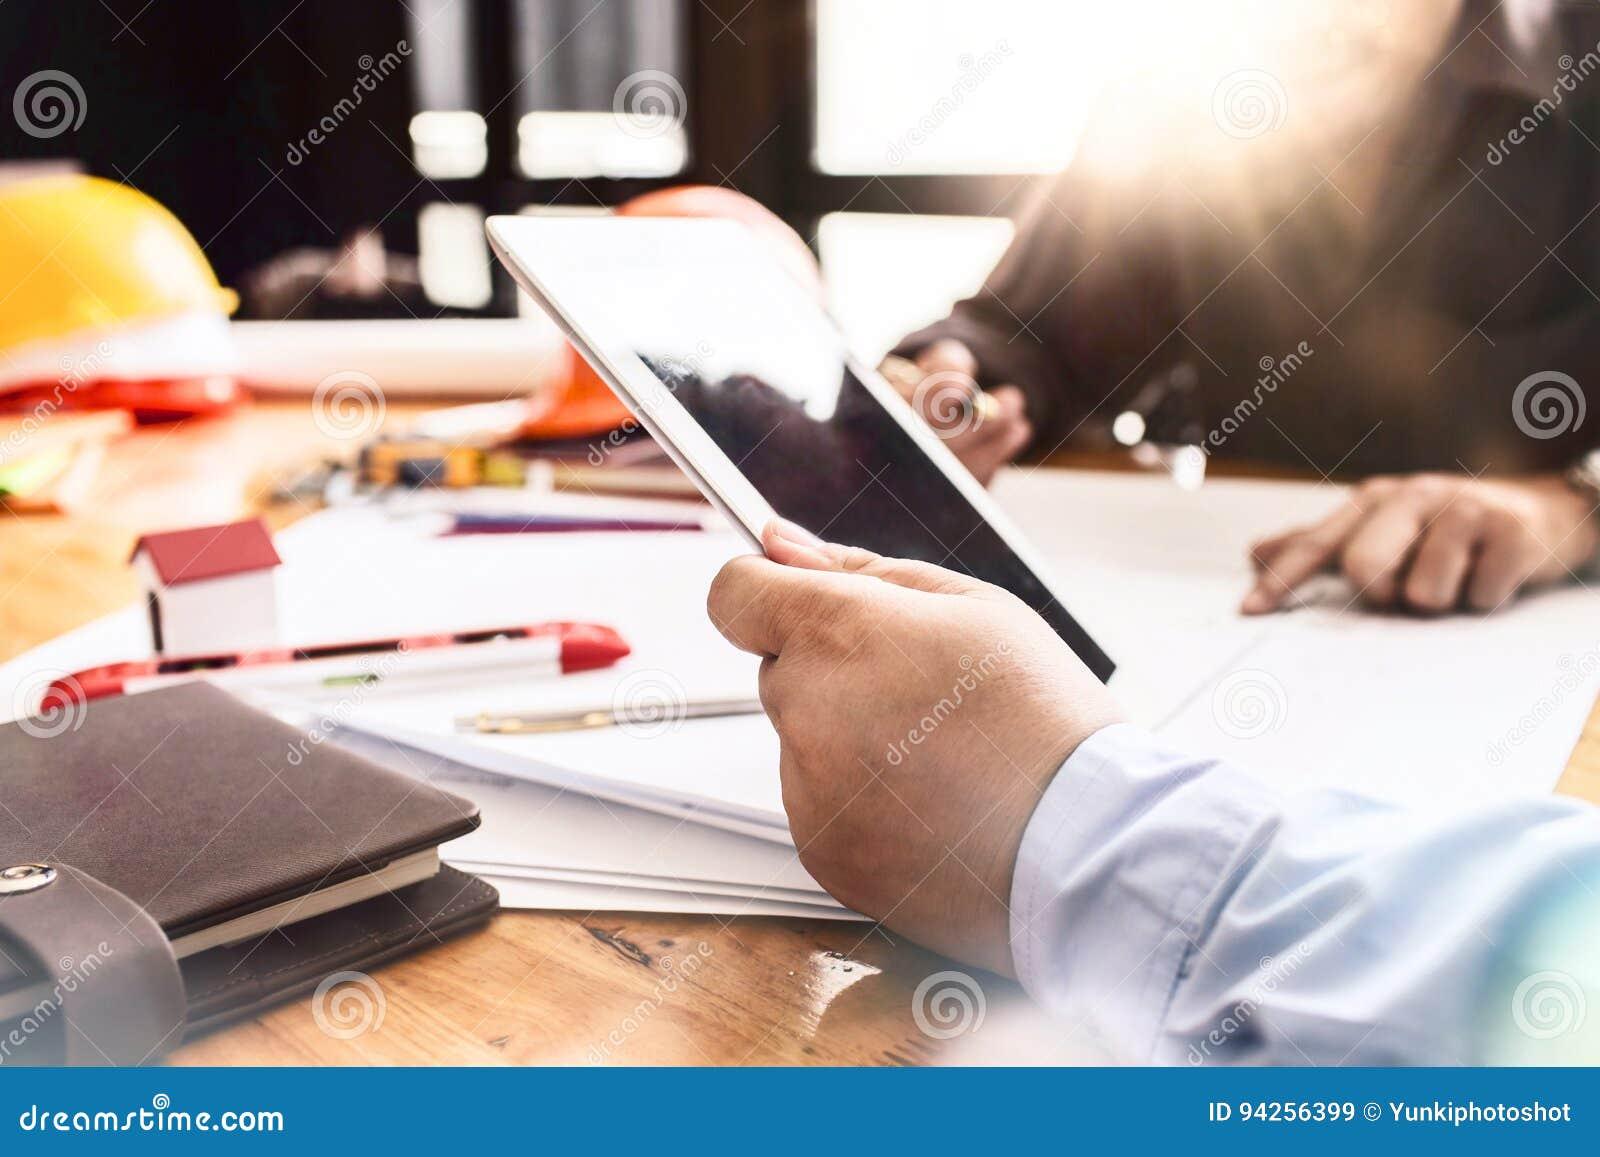 Constructiewerkzaamhedenvergadering op werkplaatskantoor die har werken